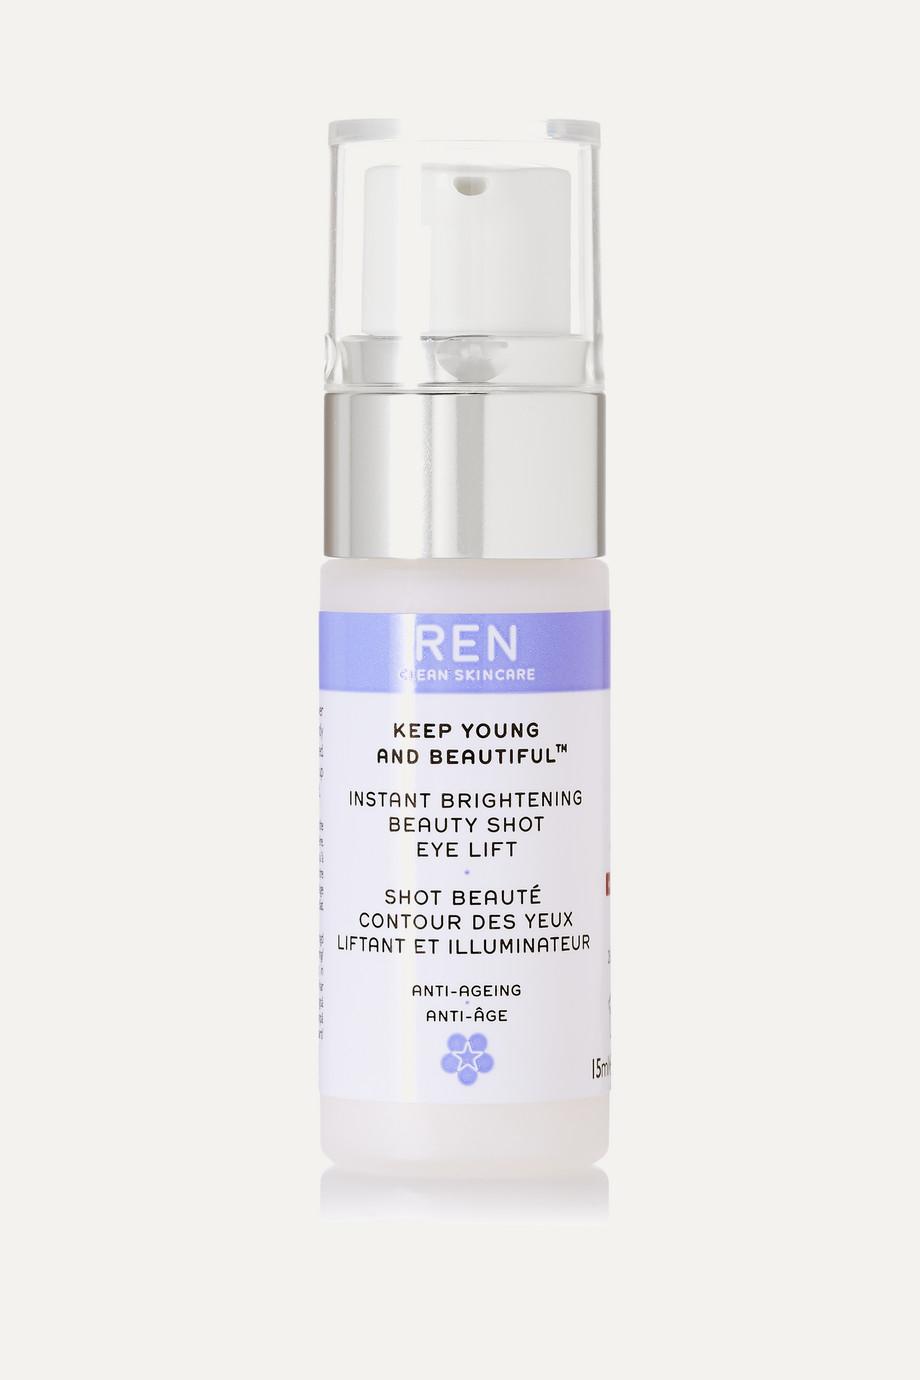 Instant Brightening Beauty Shot Eye Lift, 15ml, by Ren Skincare